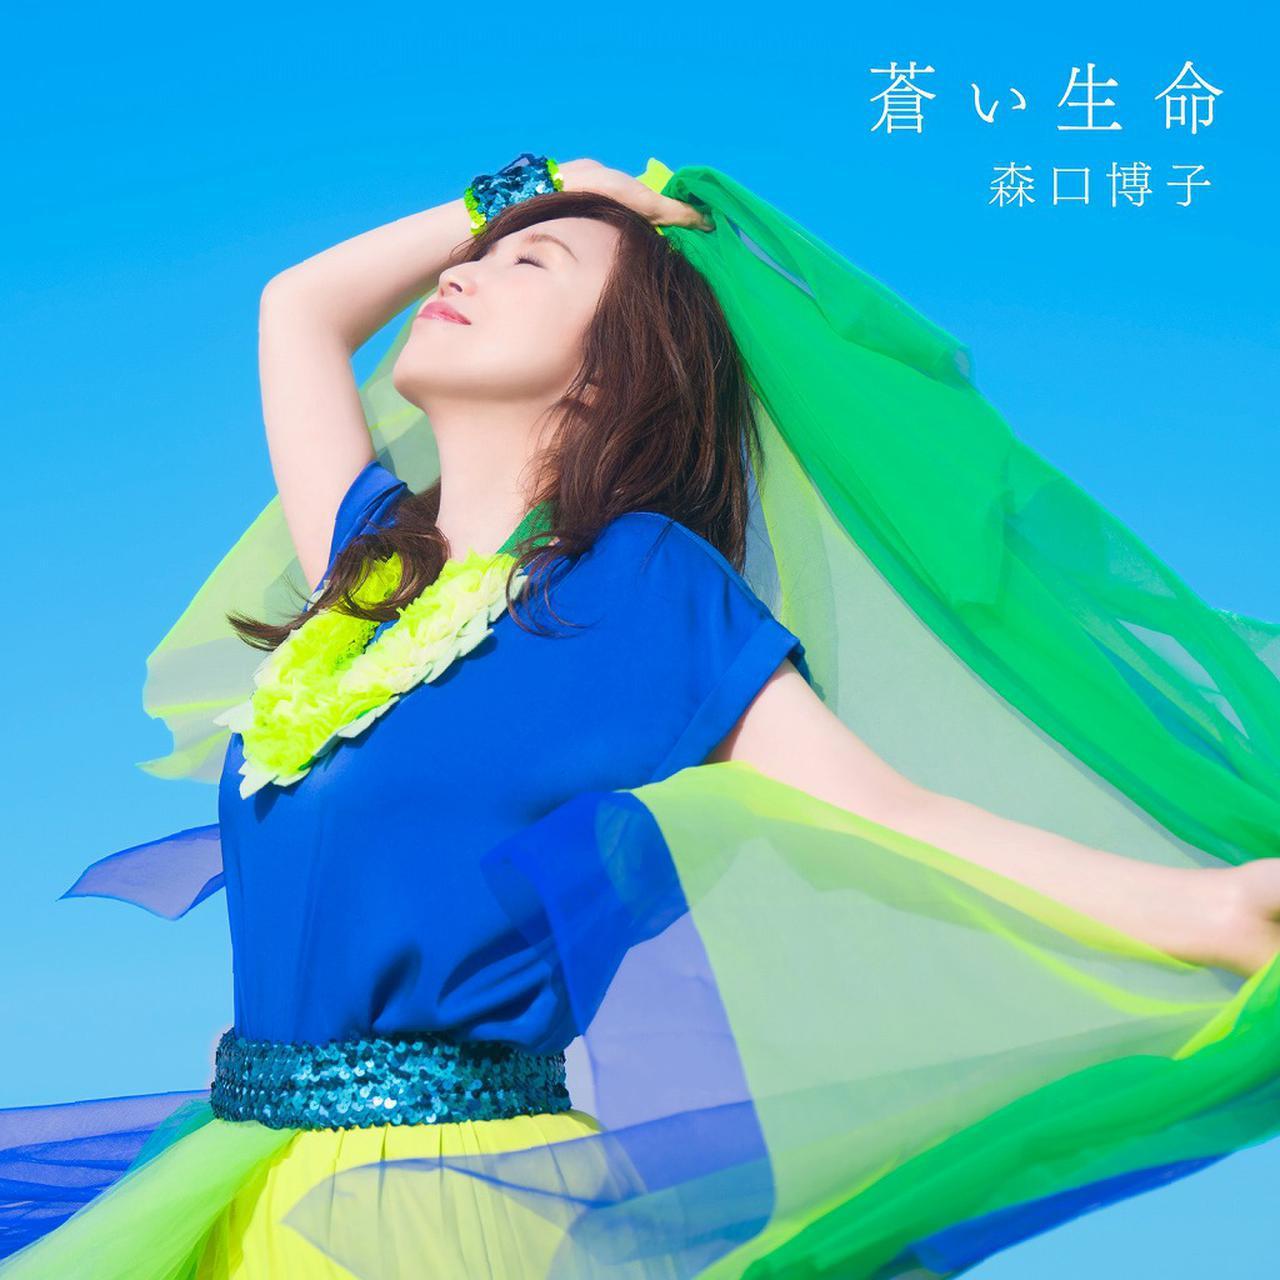 画像: 蒼い生命 / 森口博子